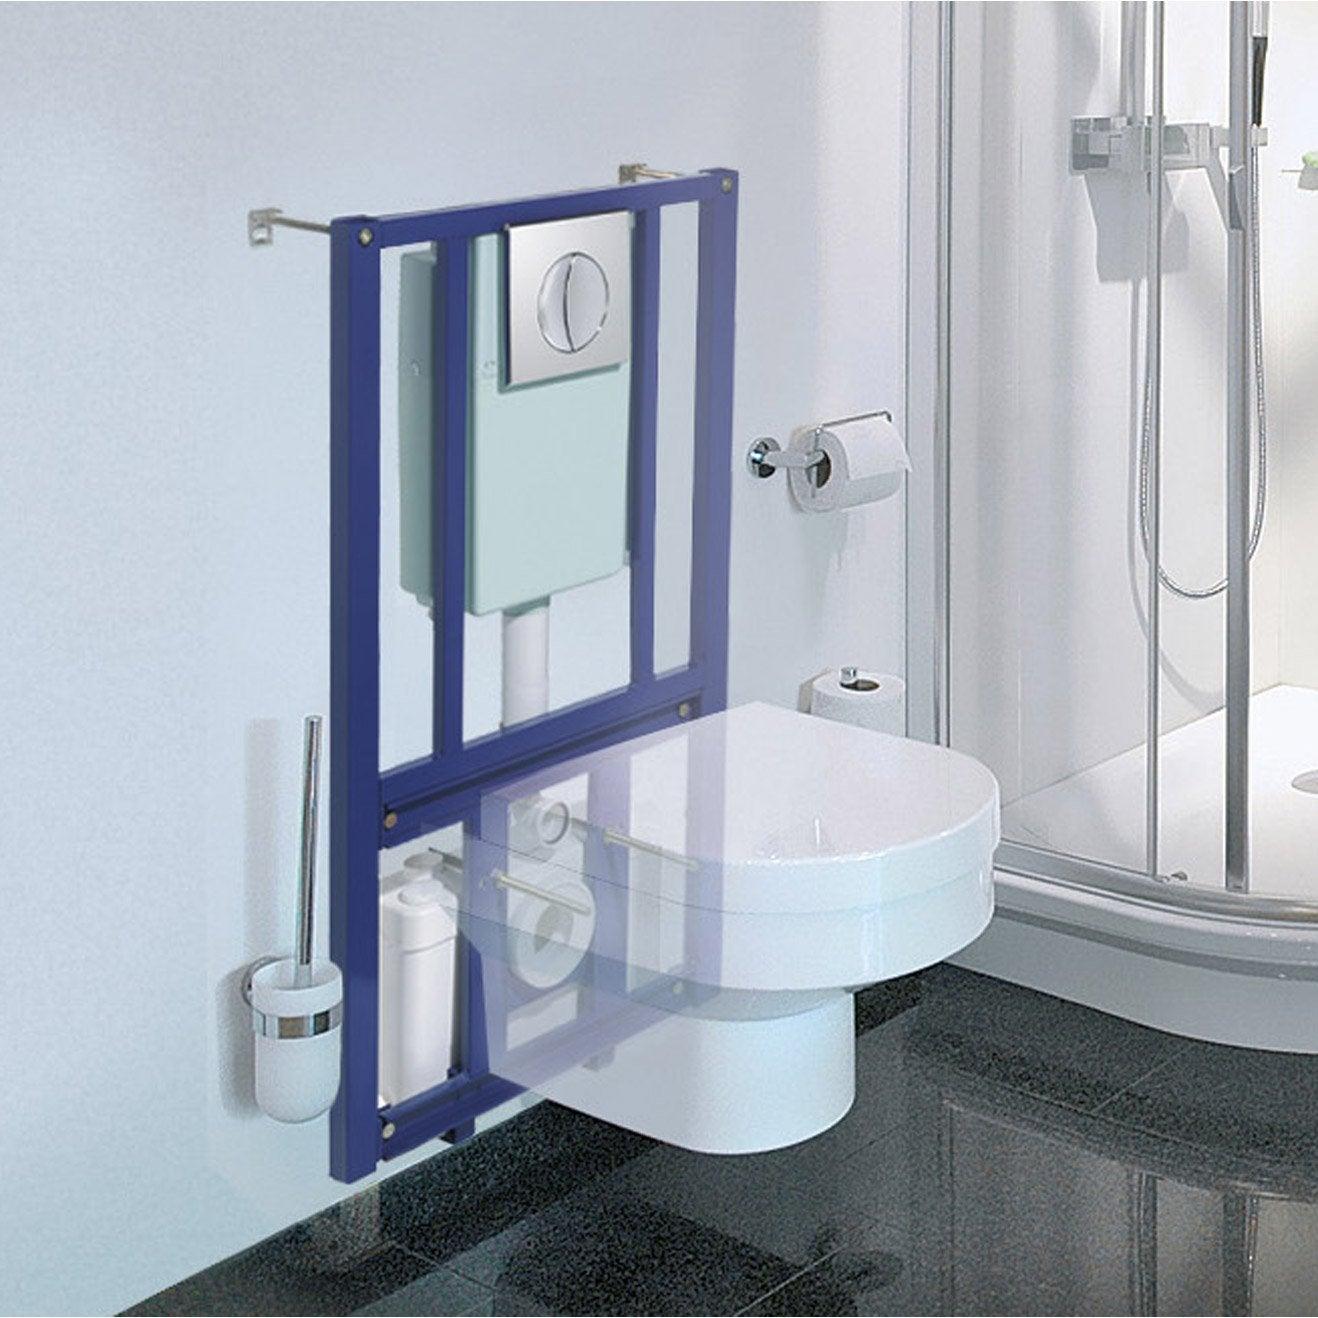 broyeur adaptable sfa saniwall leroy merlin. Black Bedroom Furniture Sets. Home Design Ideas